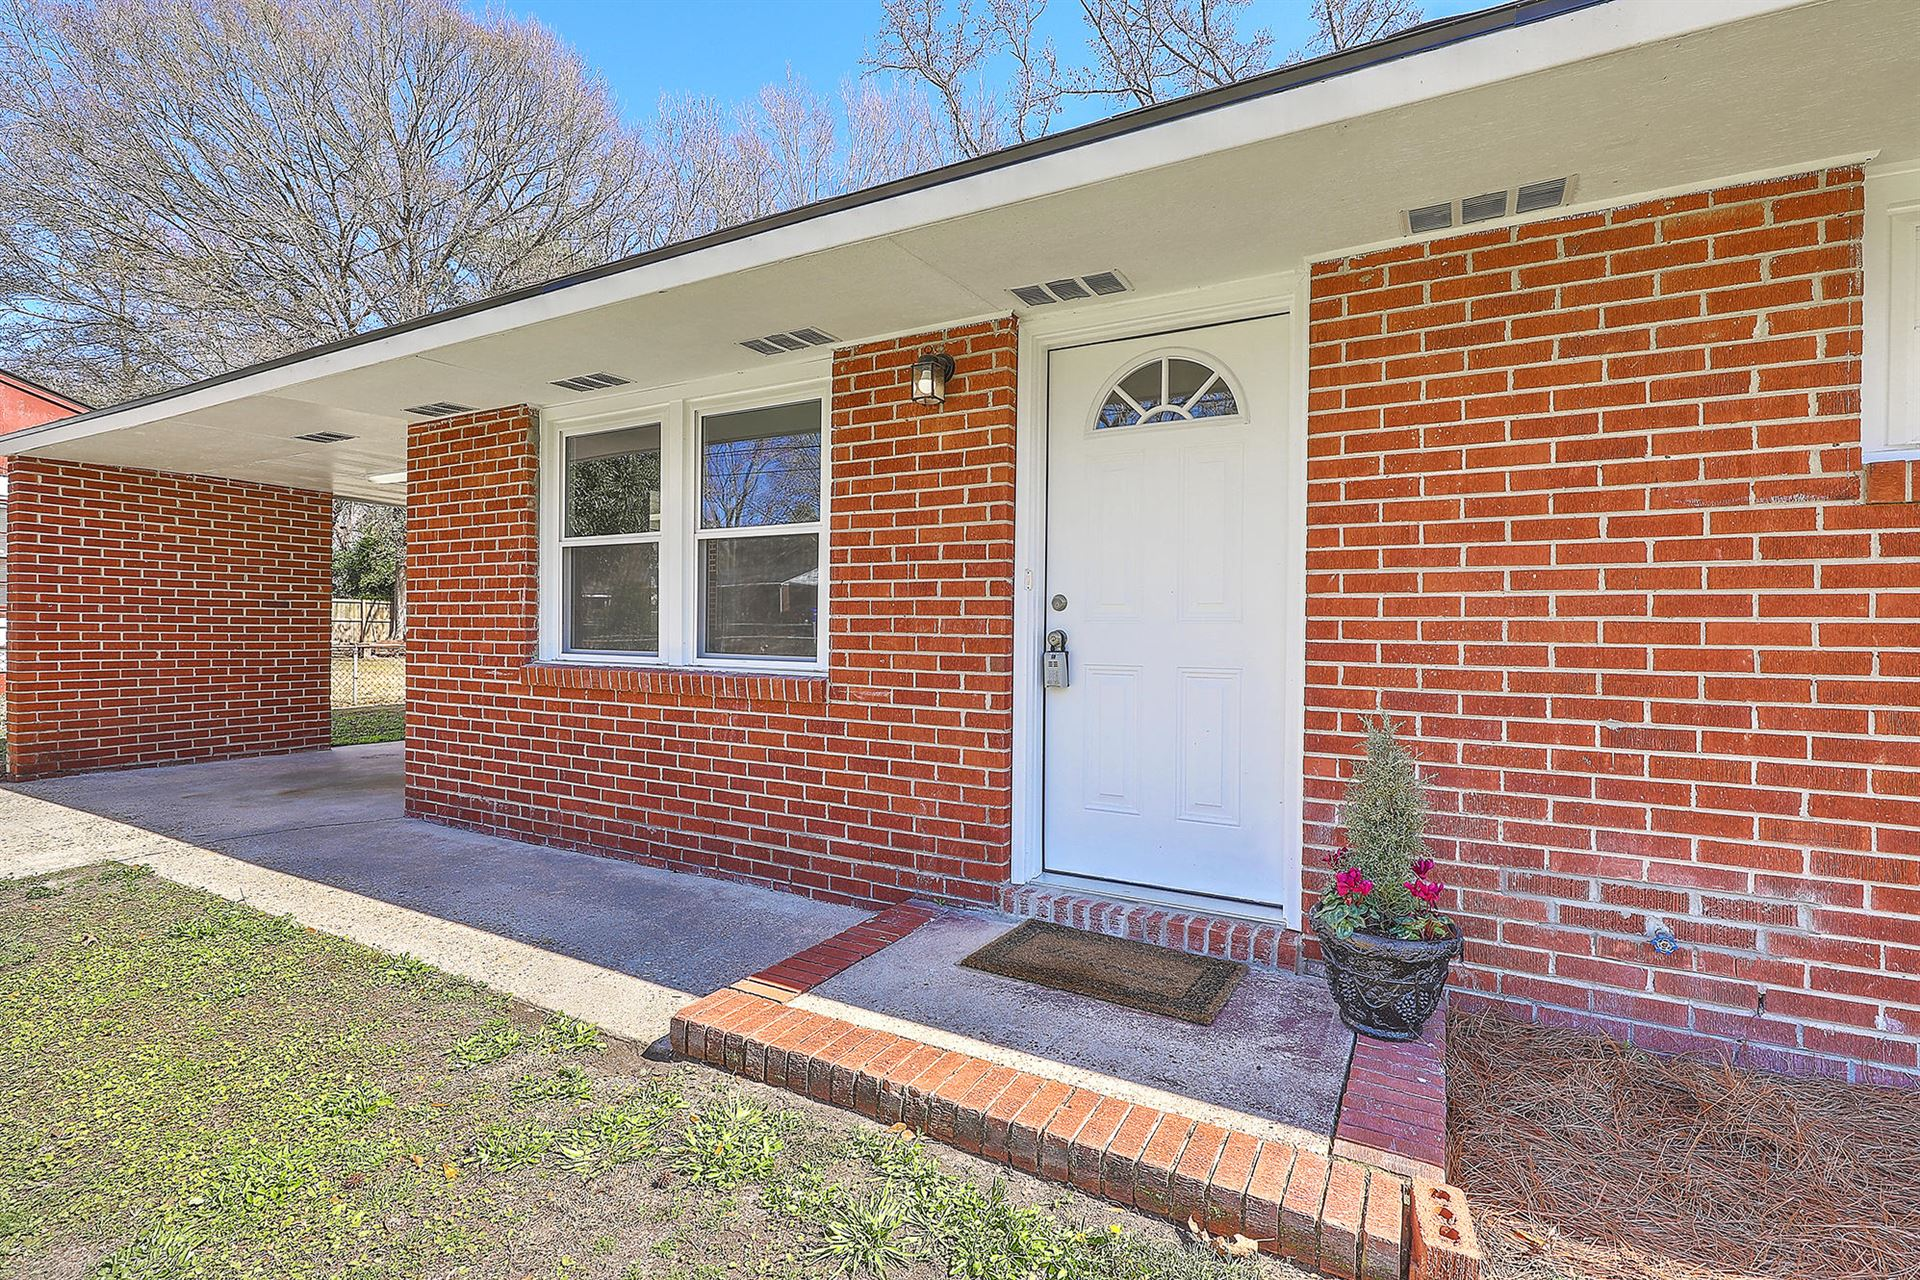 Photo of 2633 Dellwood Avenue, North Charleston, SC 29405 (MLS # 21004823)